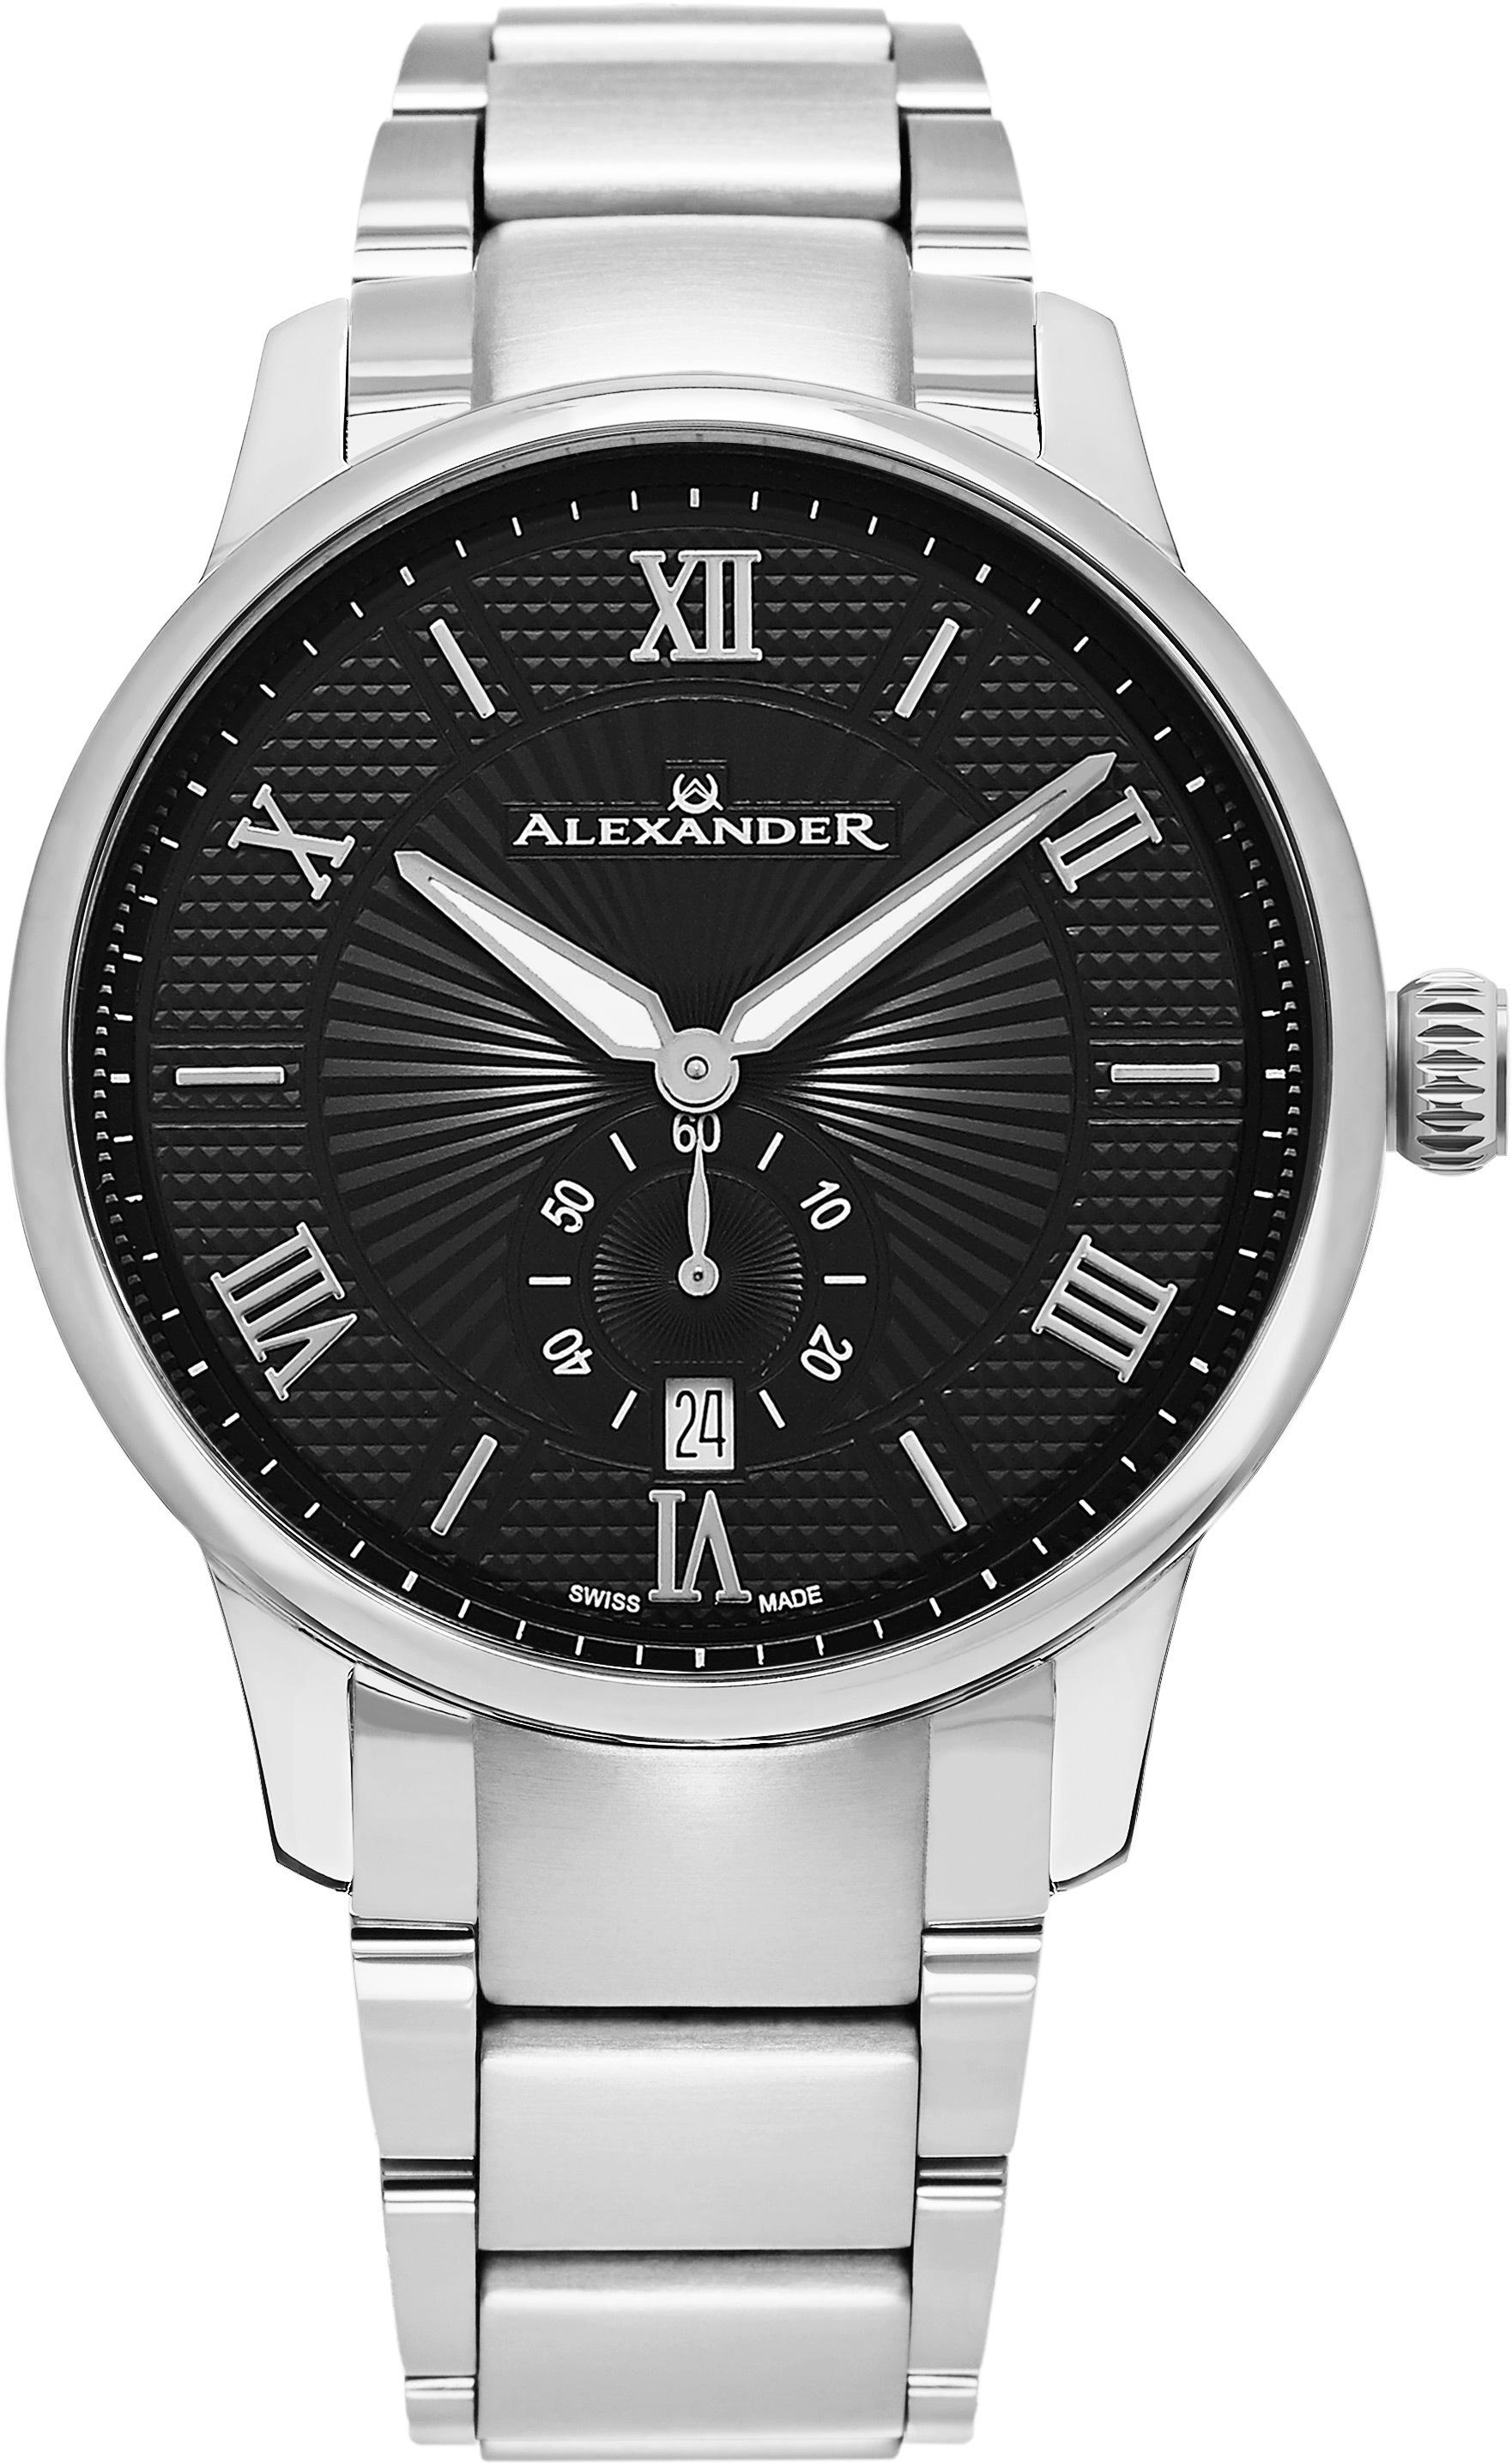 Alexander Statesman Herrklocka A102B-02 Svart/Stål Ø42 mm - Alexander